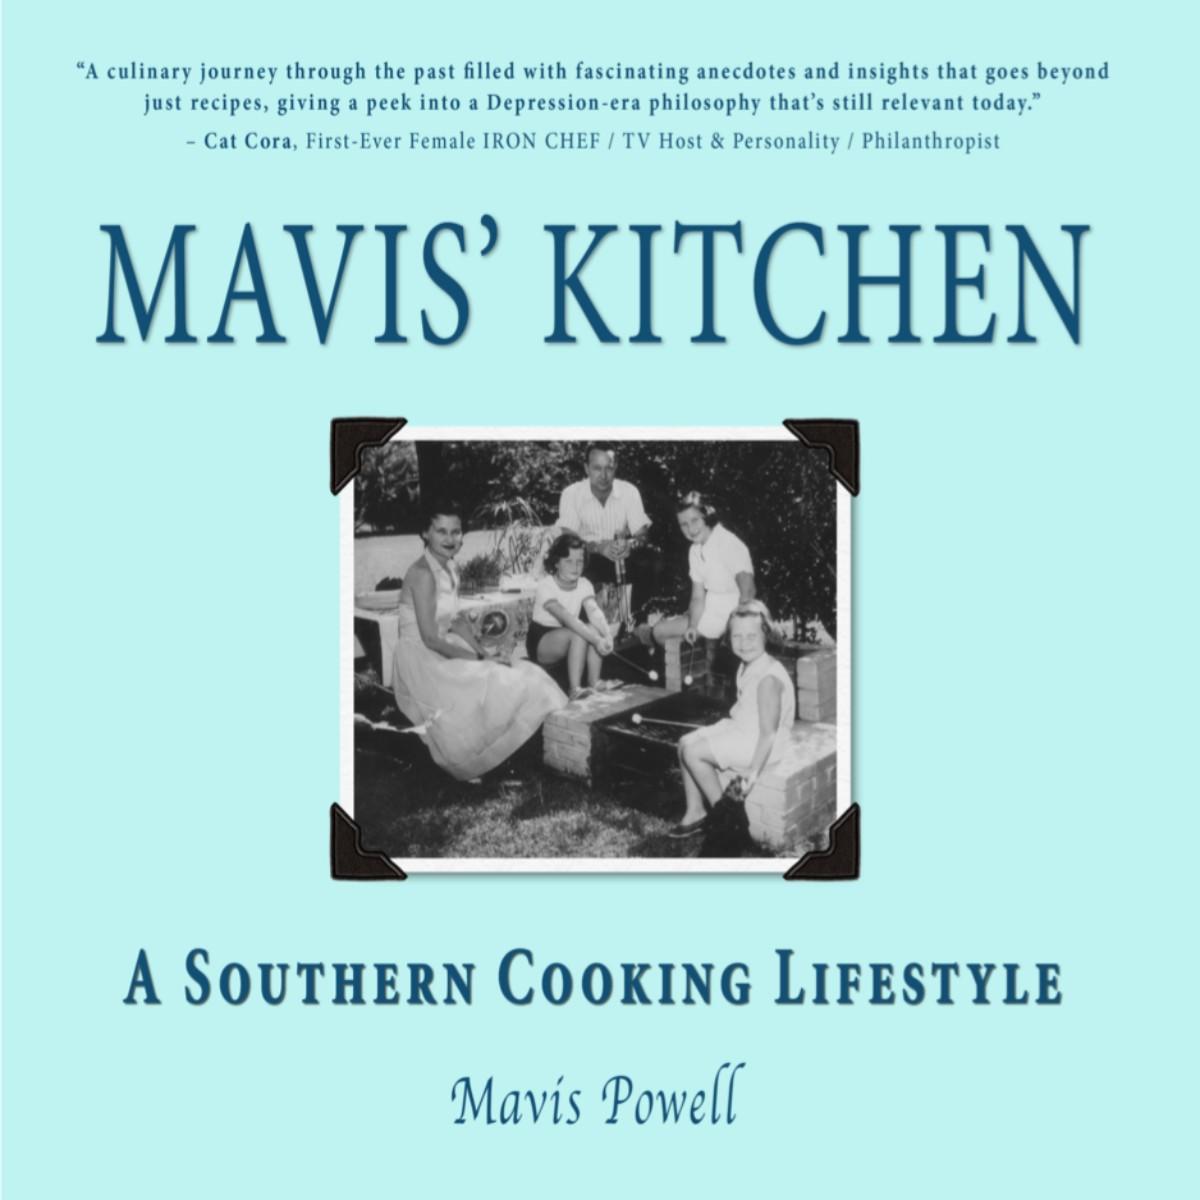 Mavis' Kitchen: A Southern Cooking Lifestyle